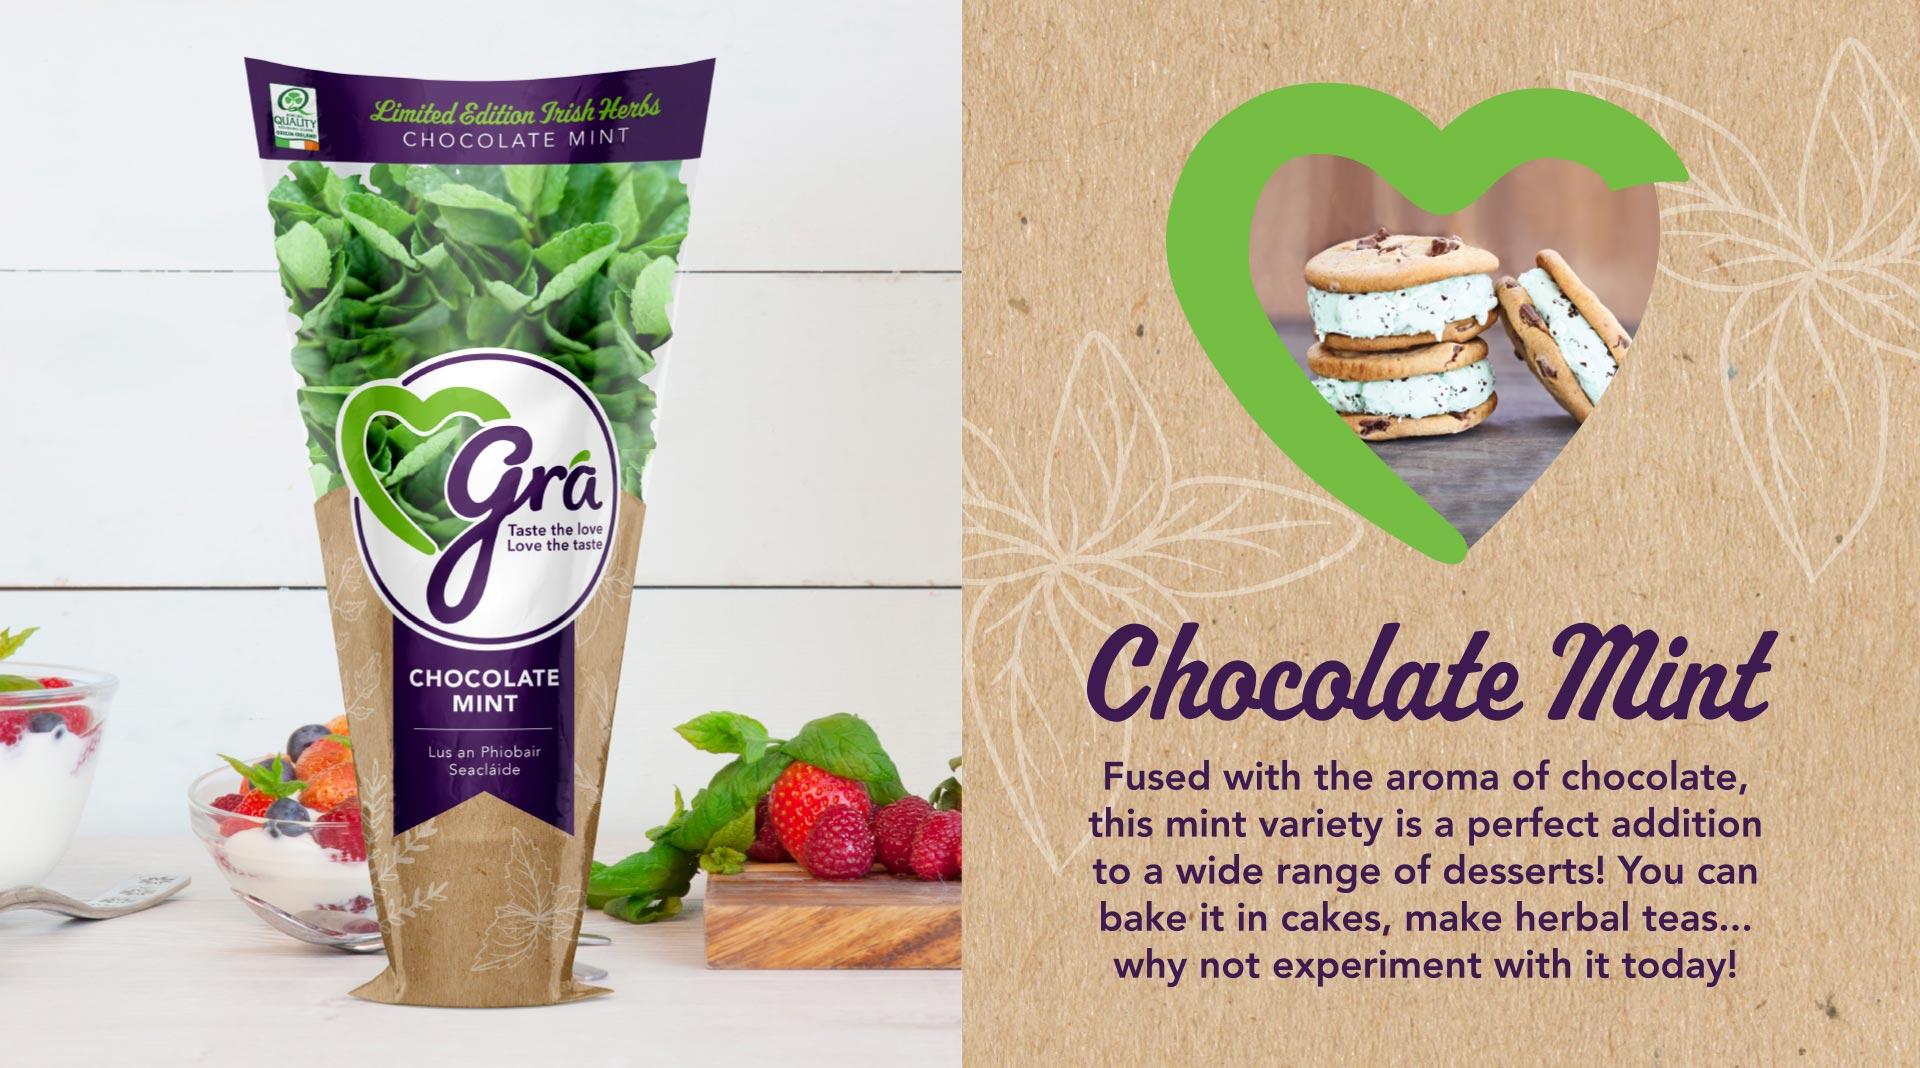 Grá limited edition herb packaging design.